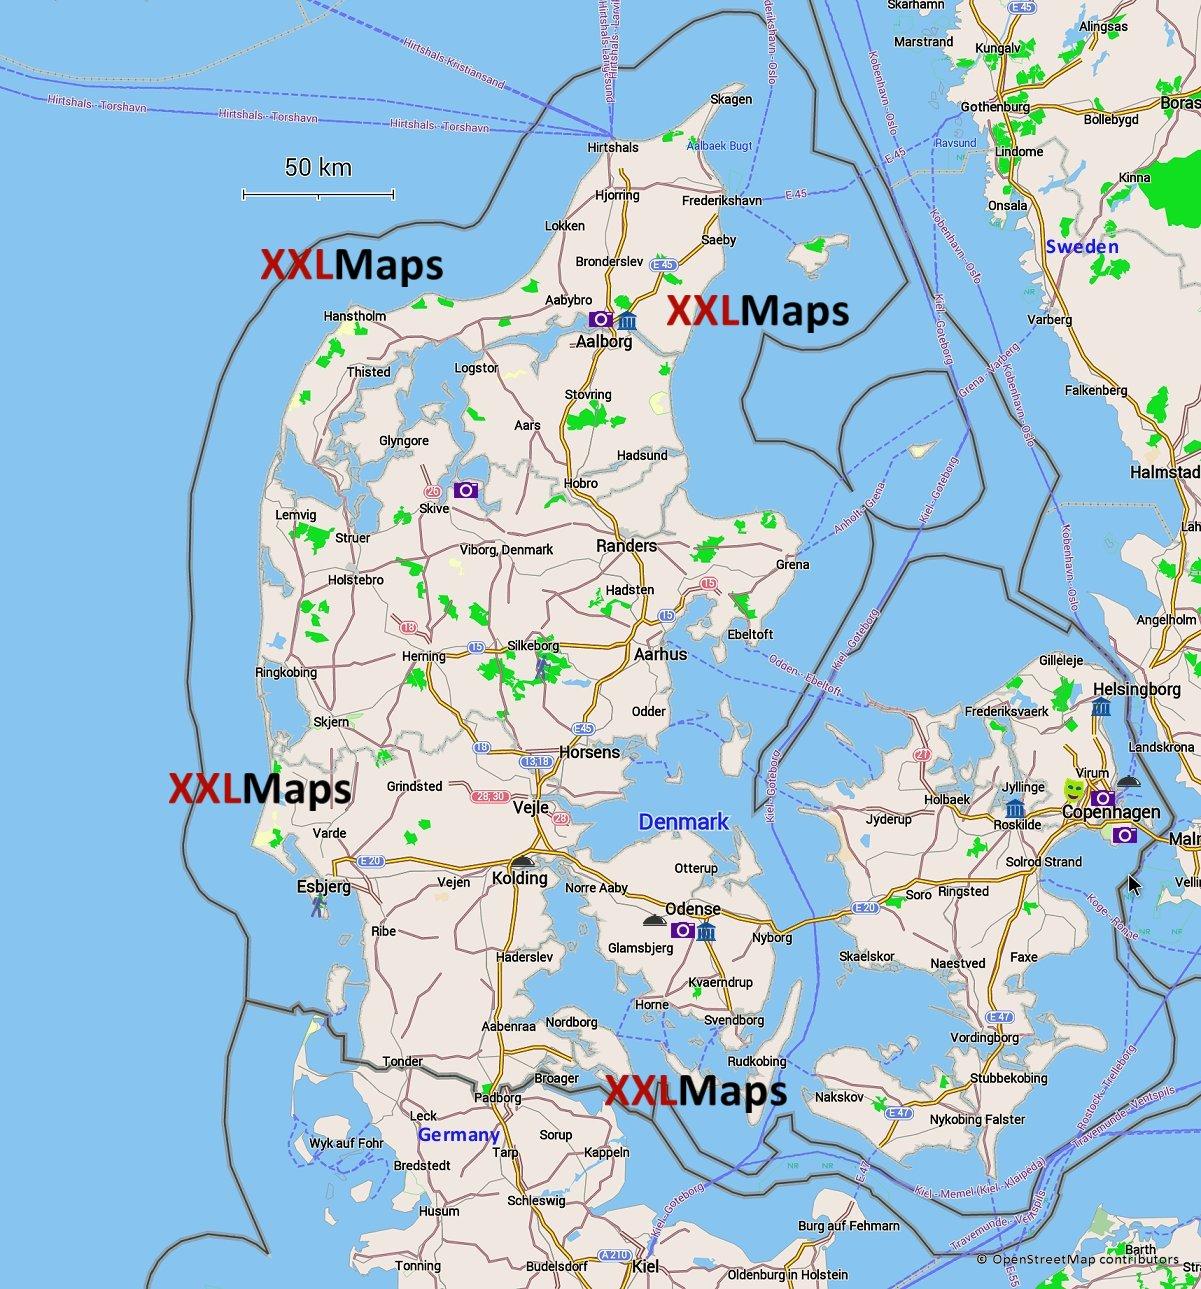 kart over danmark Kart Over Danmark | Kart